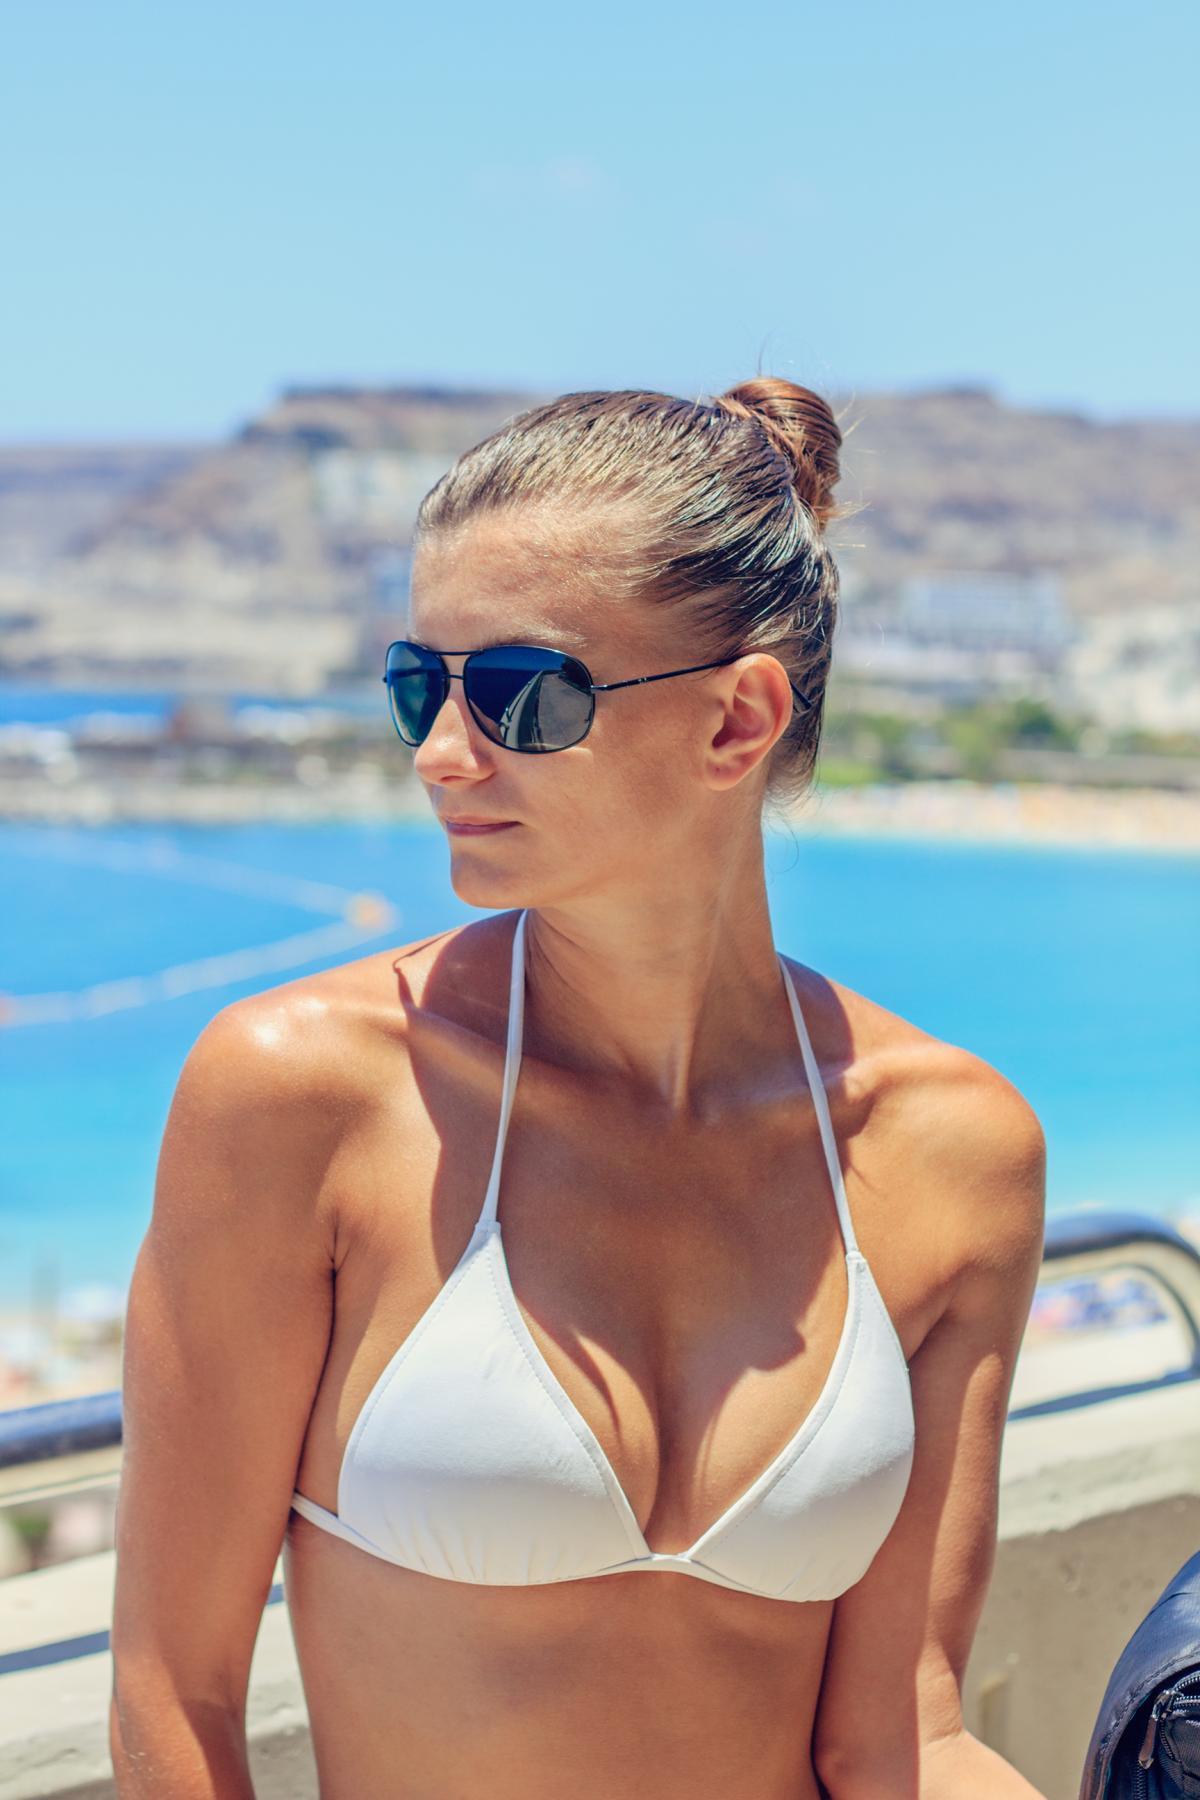 Free beach bikini photographs sorry, does